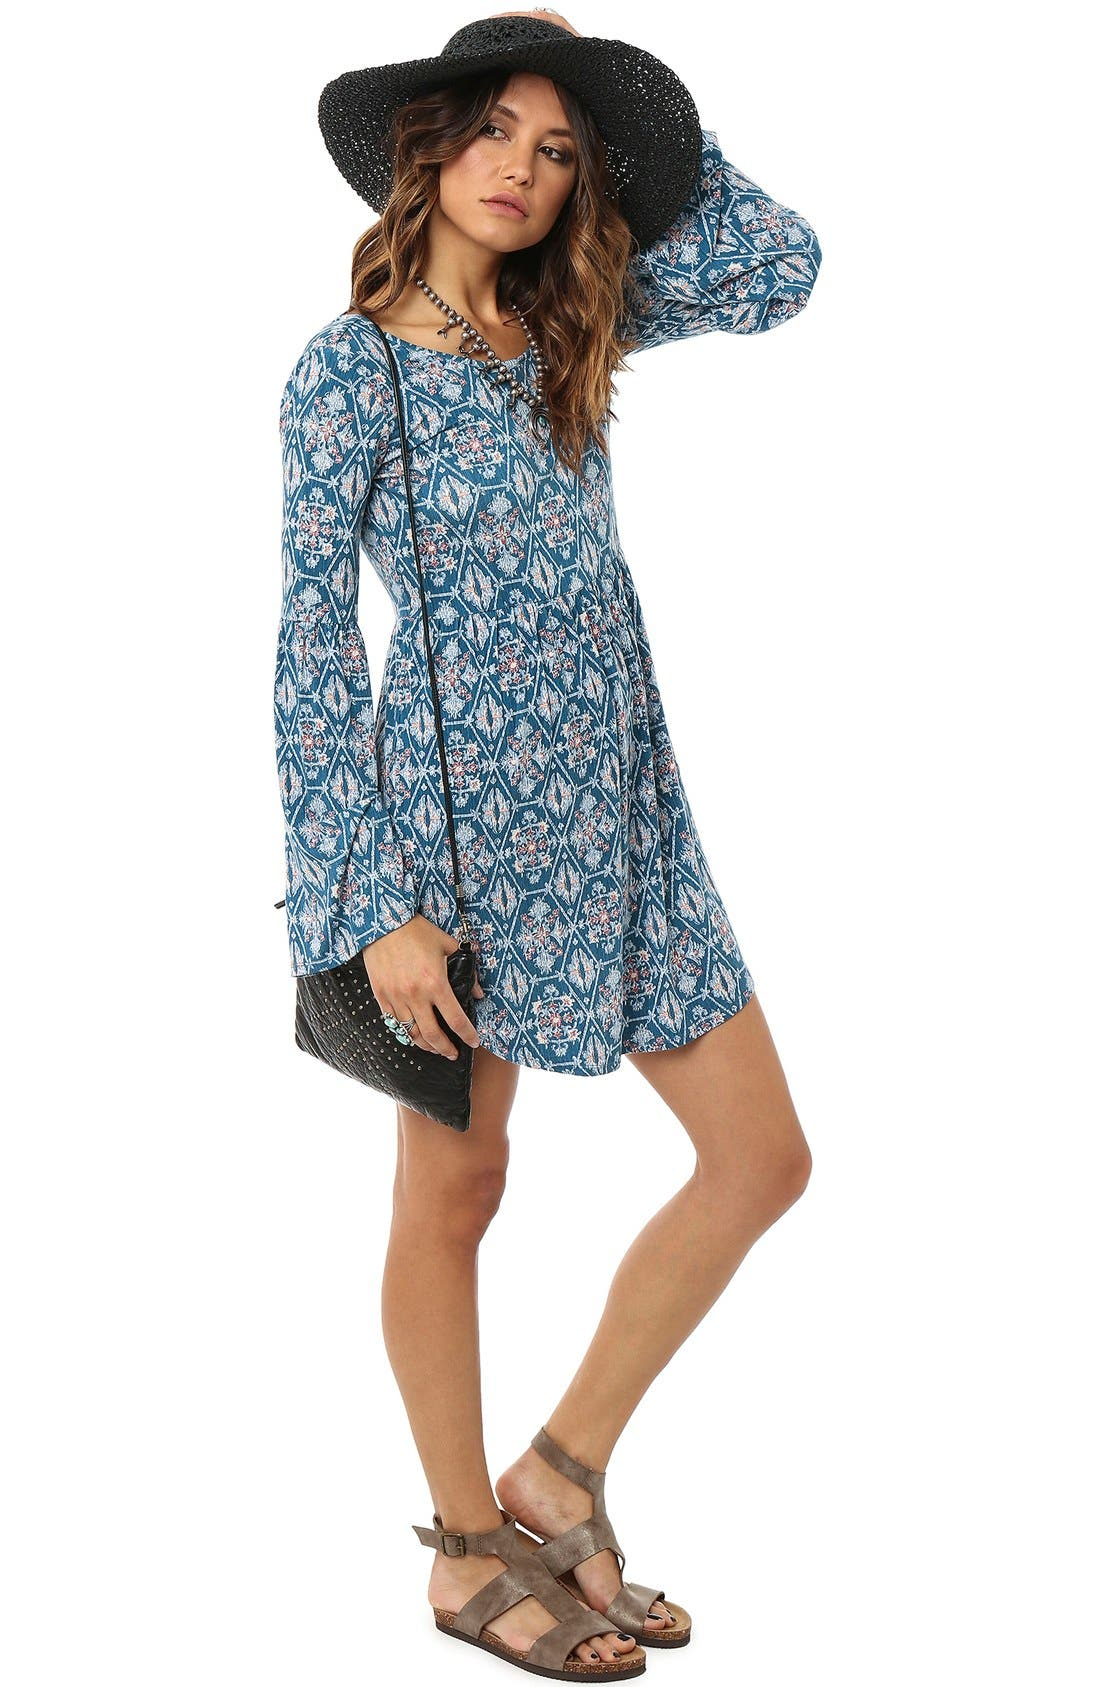 Alternate Image 1 Selected - O'Neill 'Beverly' Print Bell Sleeve Dress